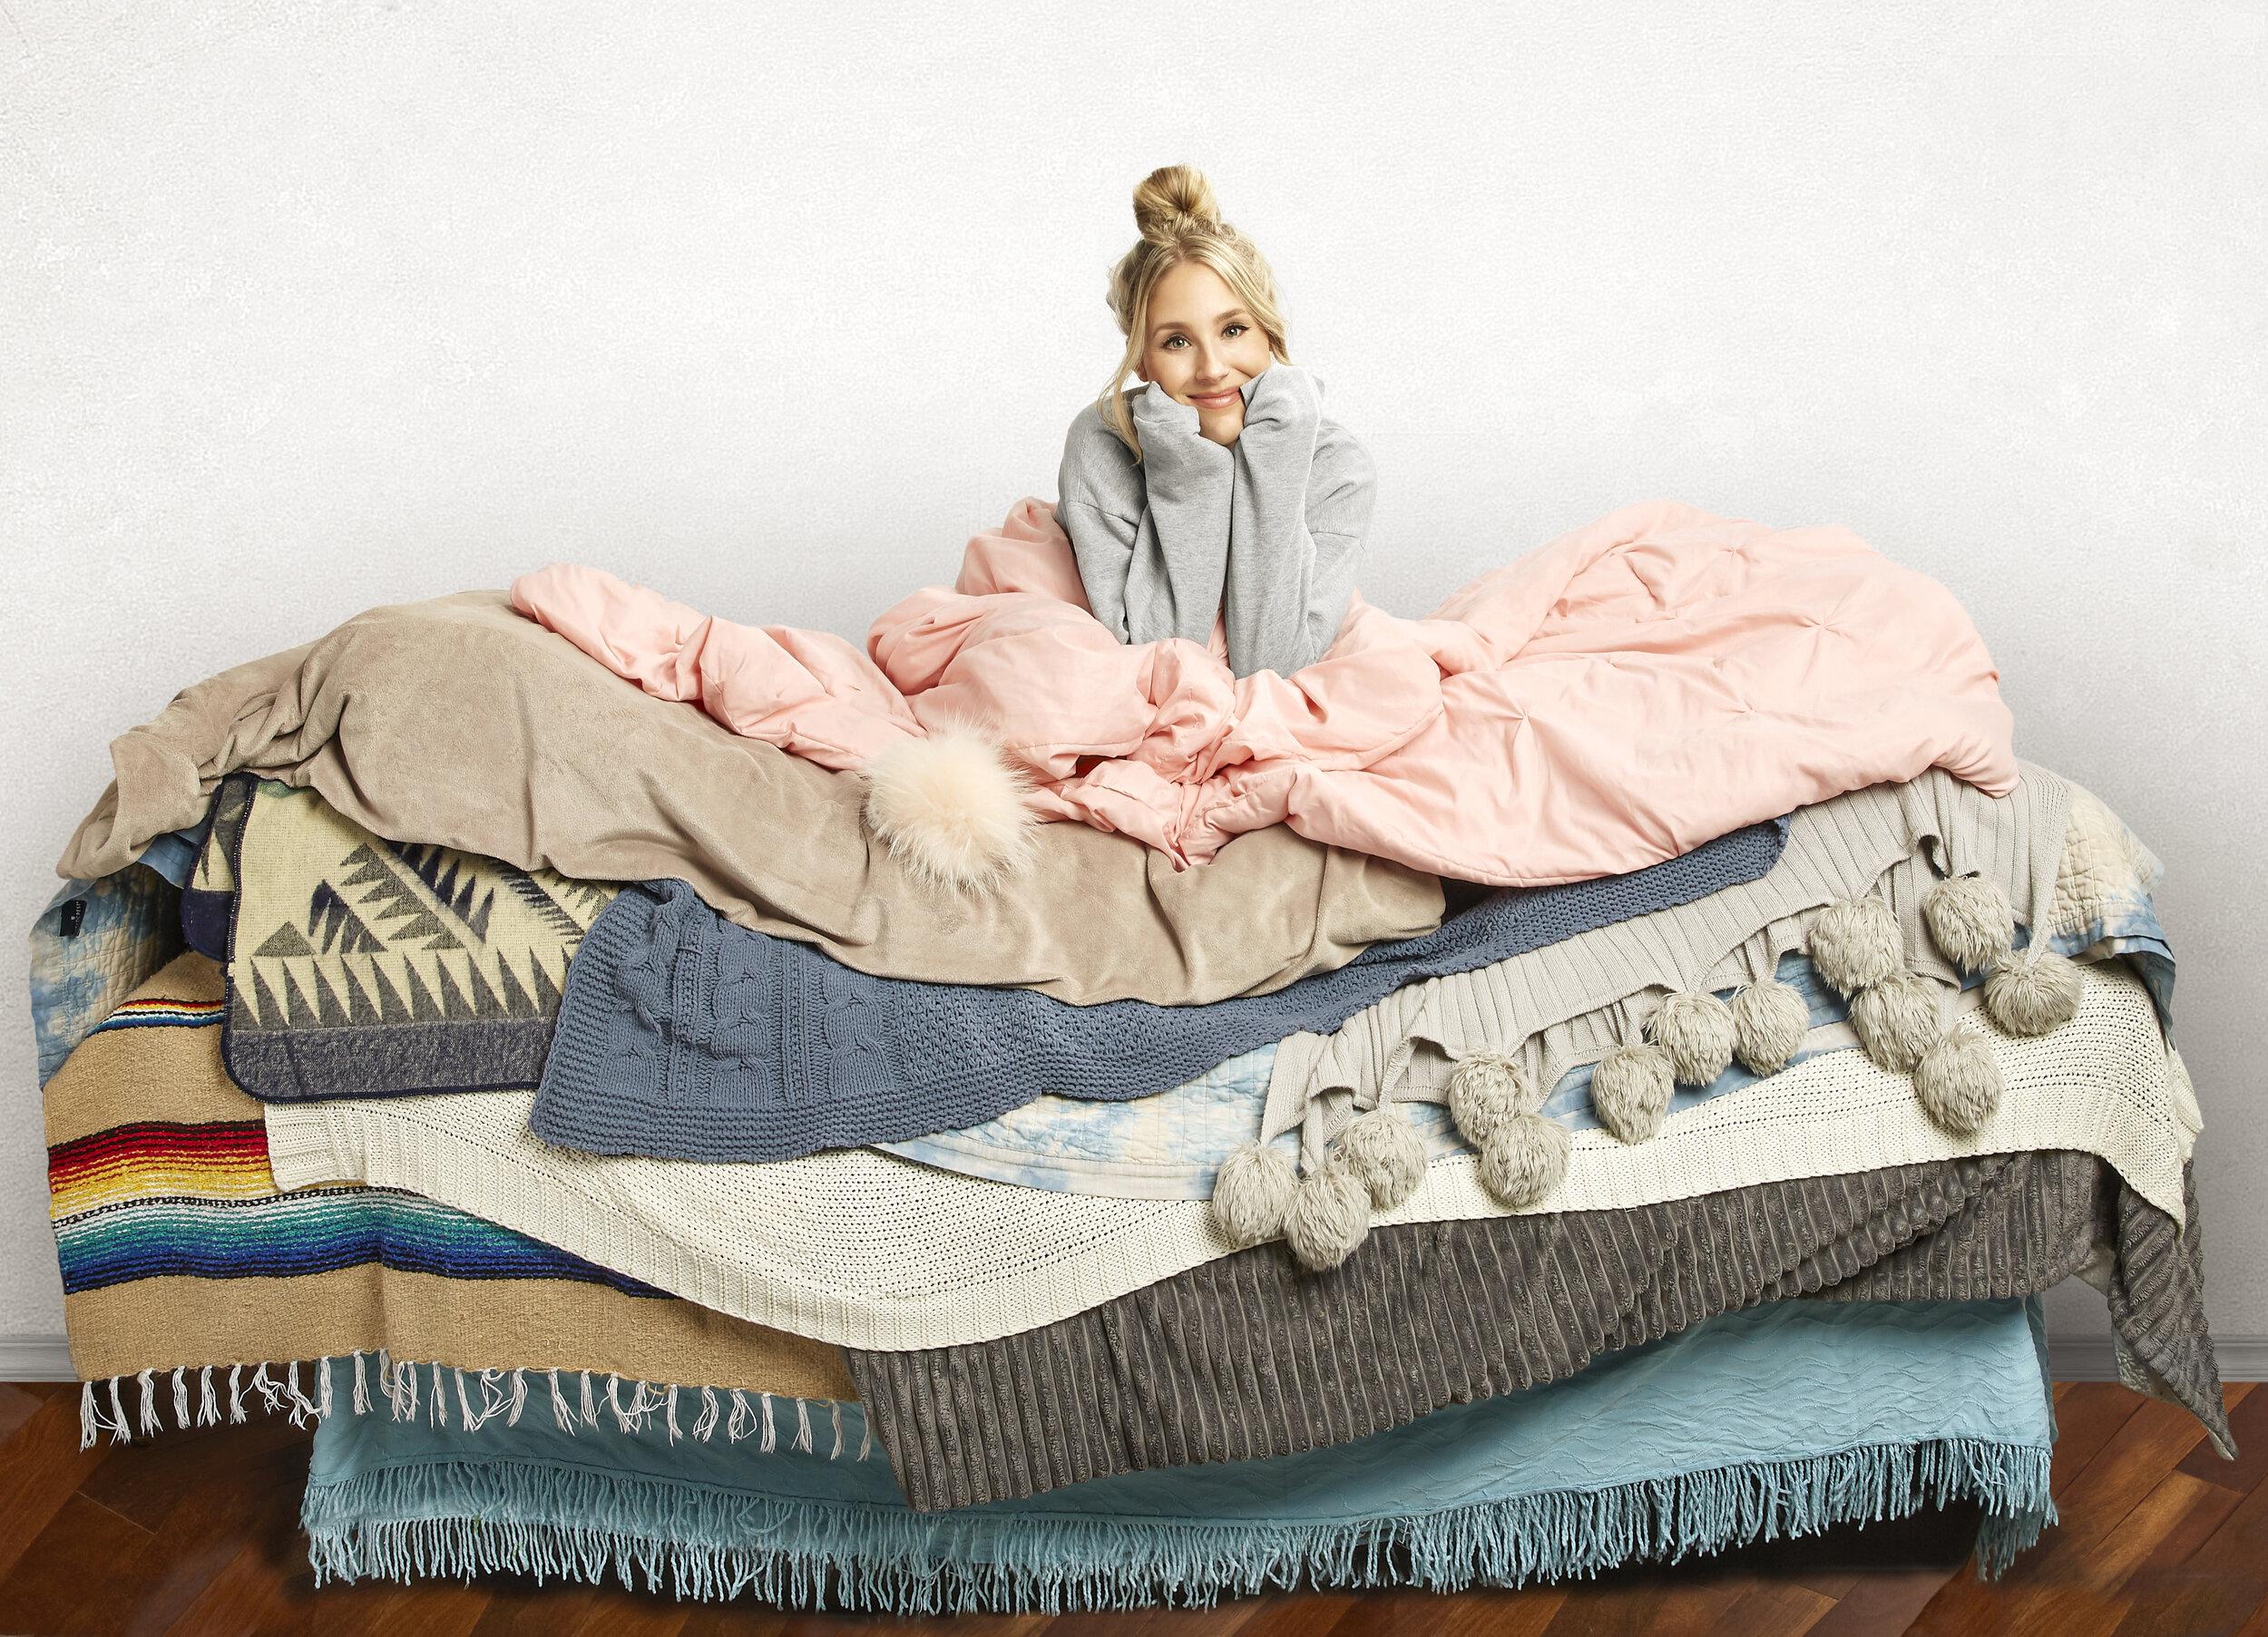 Lisa Gilroy on a pile of blankets